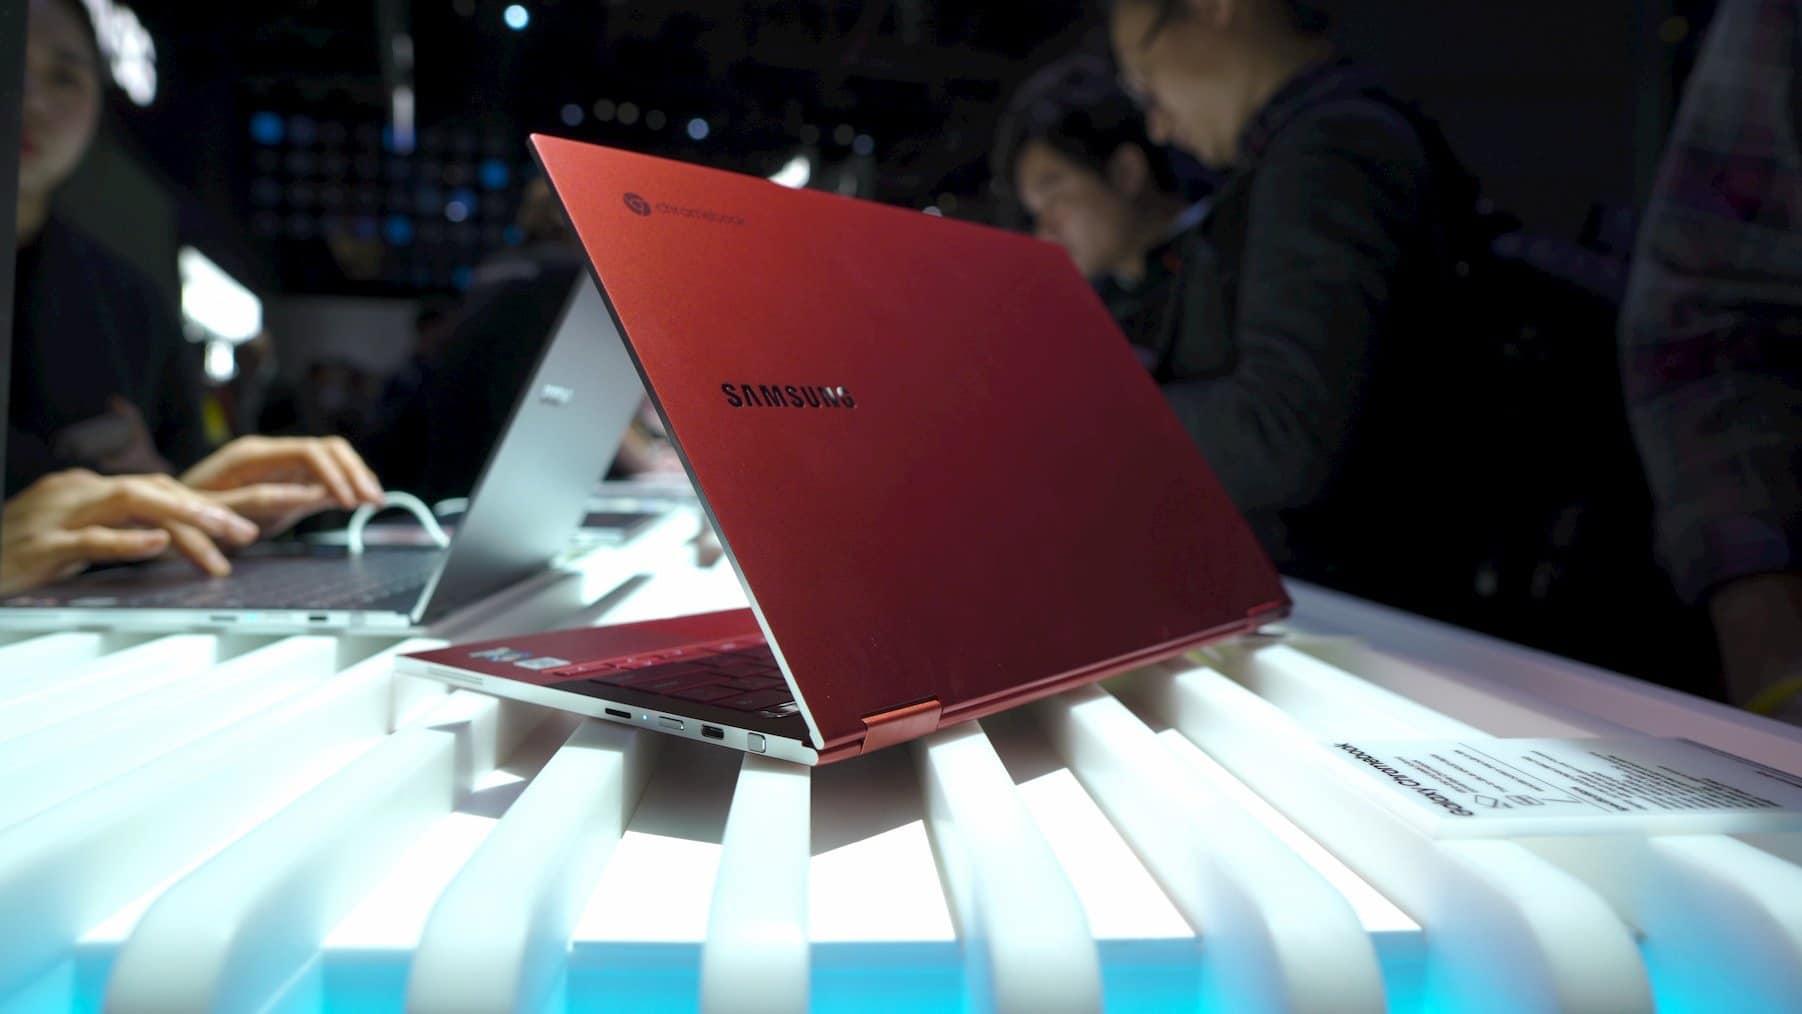 Samsung Galaxy Chromebook 2 priced at $699 TechRechard